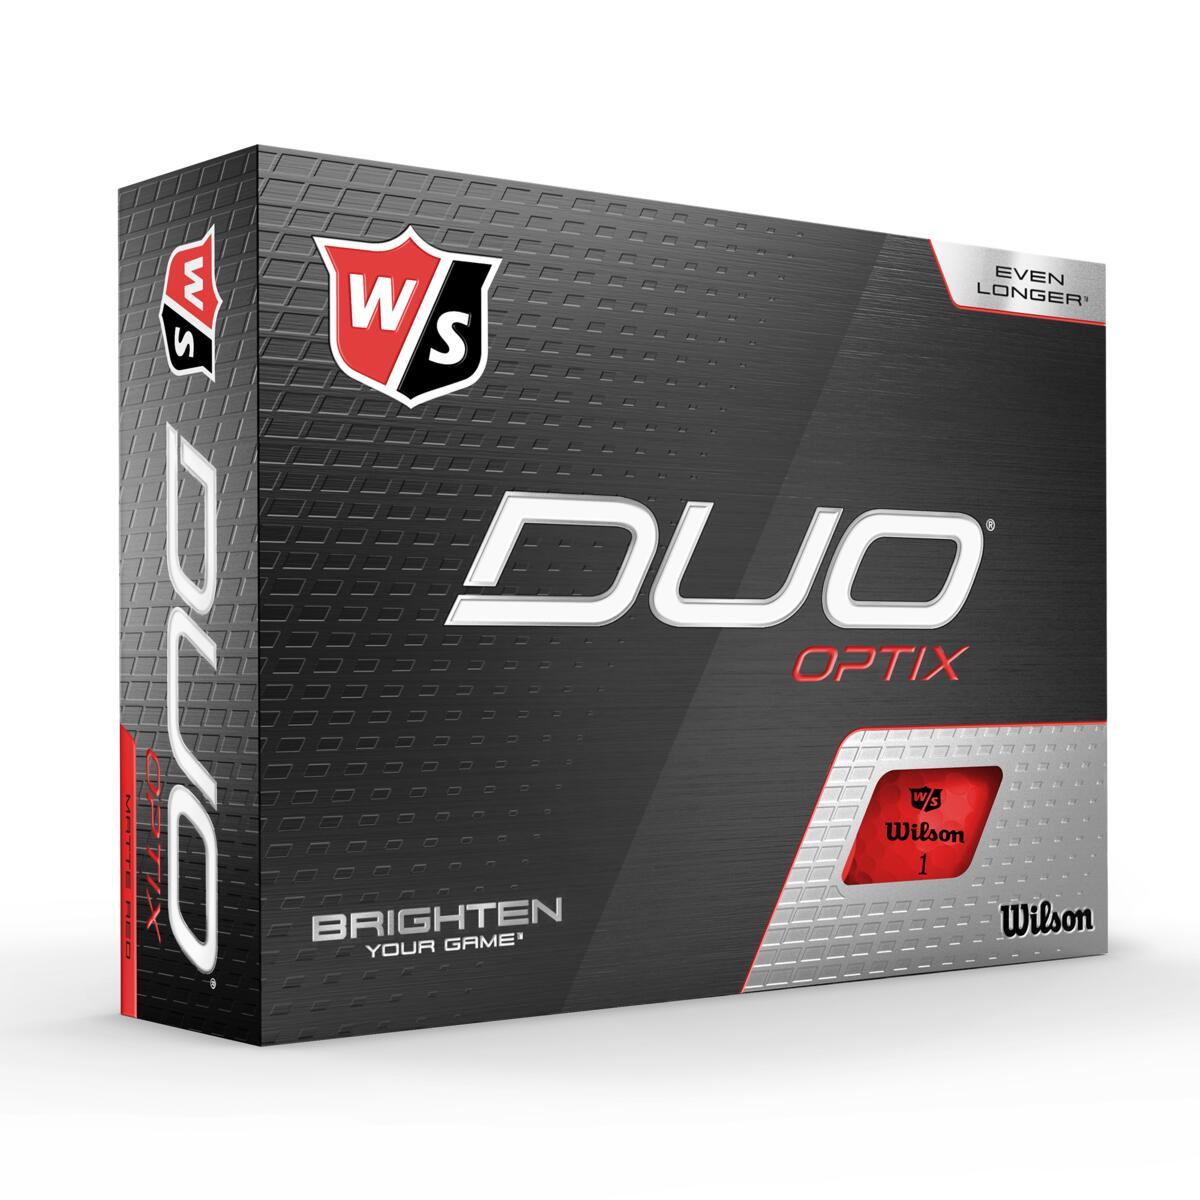 Wilson - Duo OPTIX Red 12pack Golf Balls